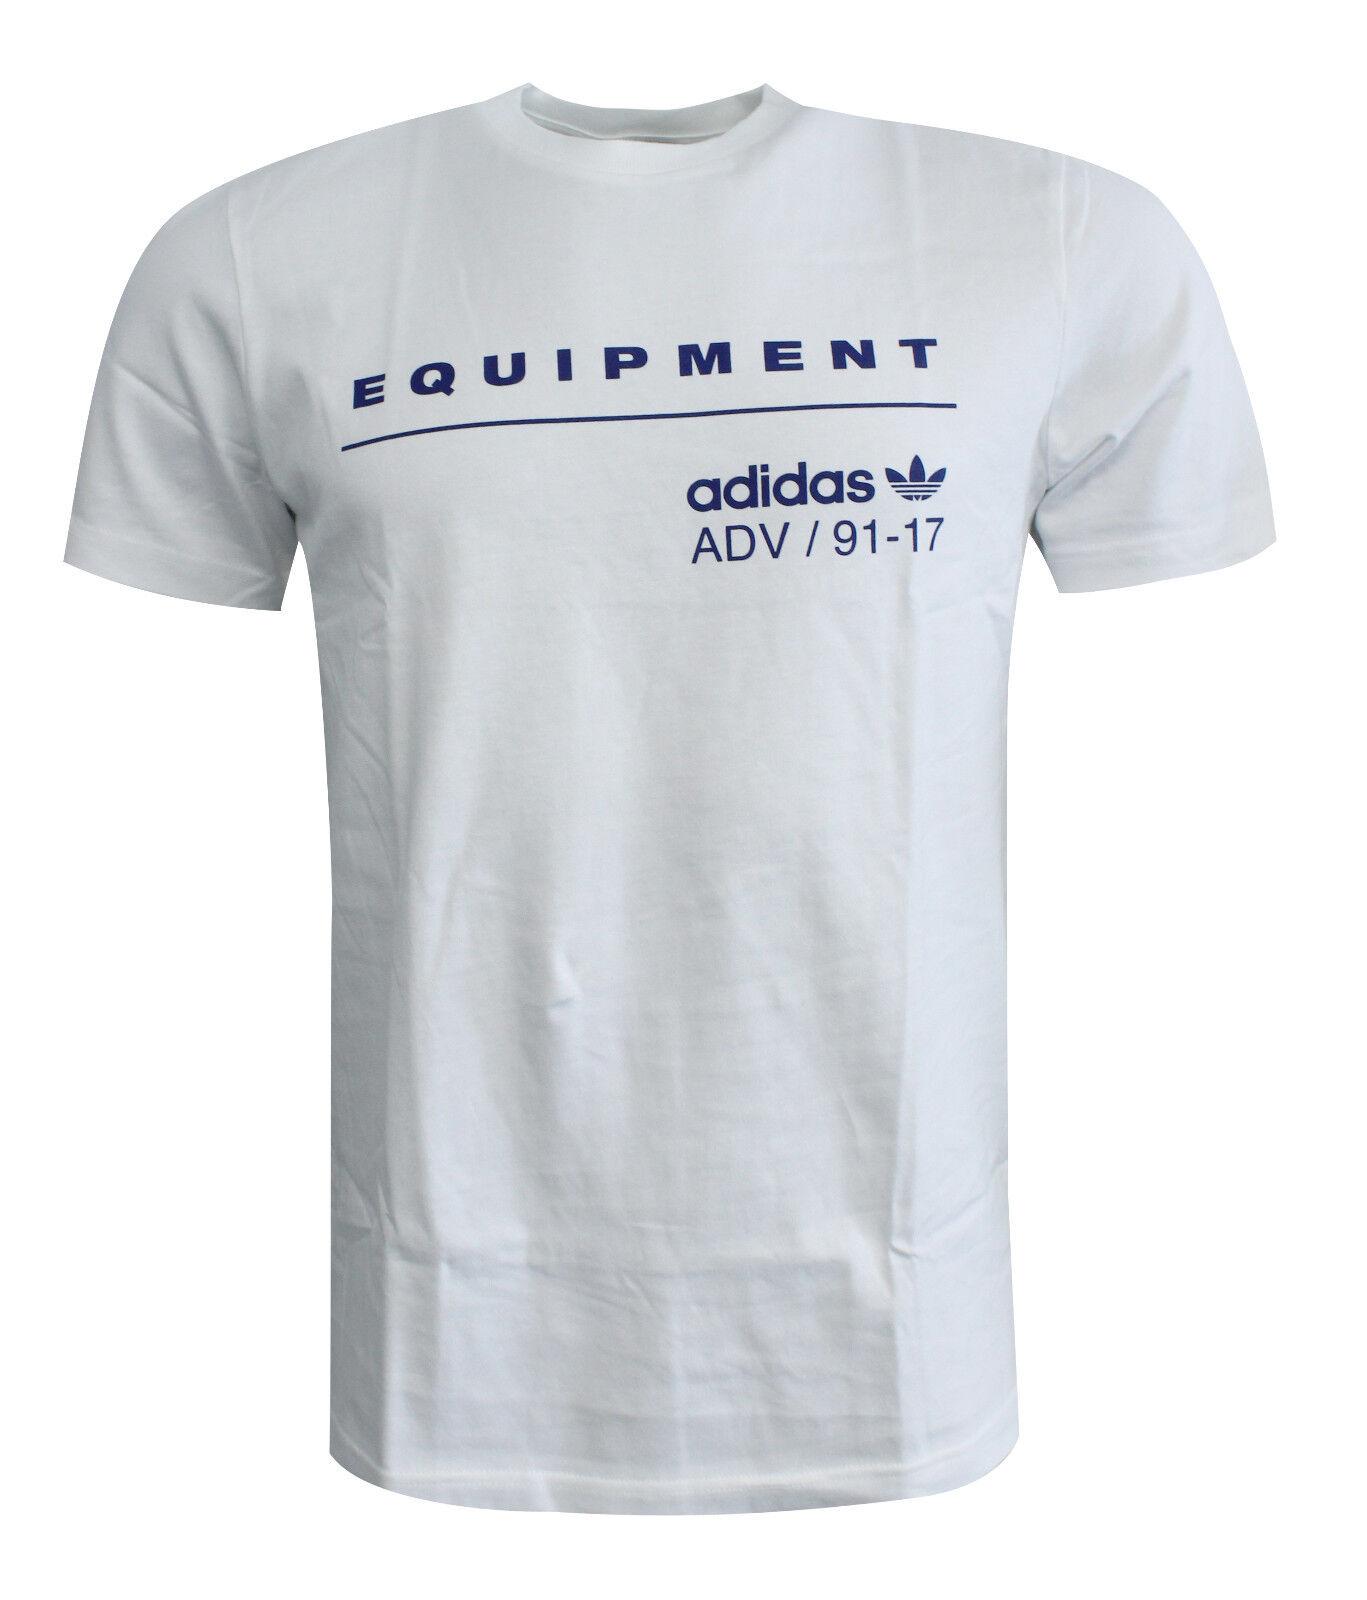 c93897aa Pdx Adidas Corta Estampado Blanca Clásico Manga Top Camiseta Hombre 54jLRA